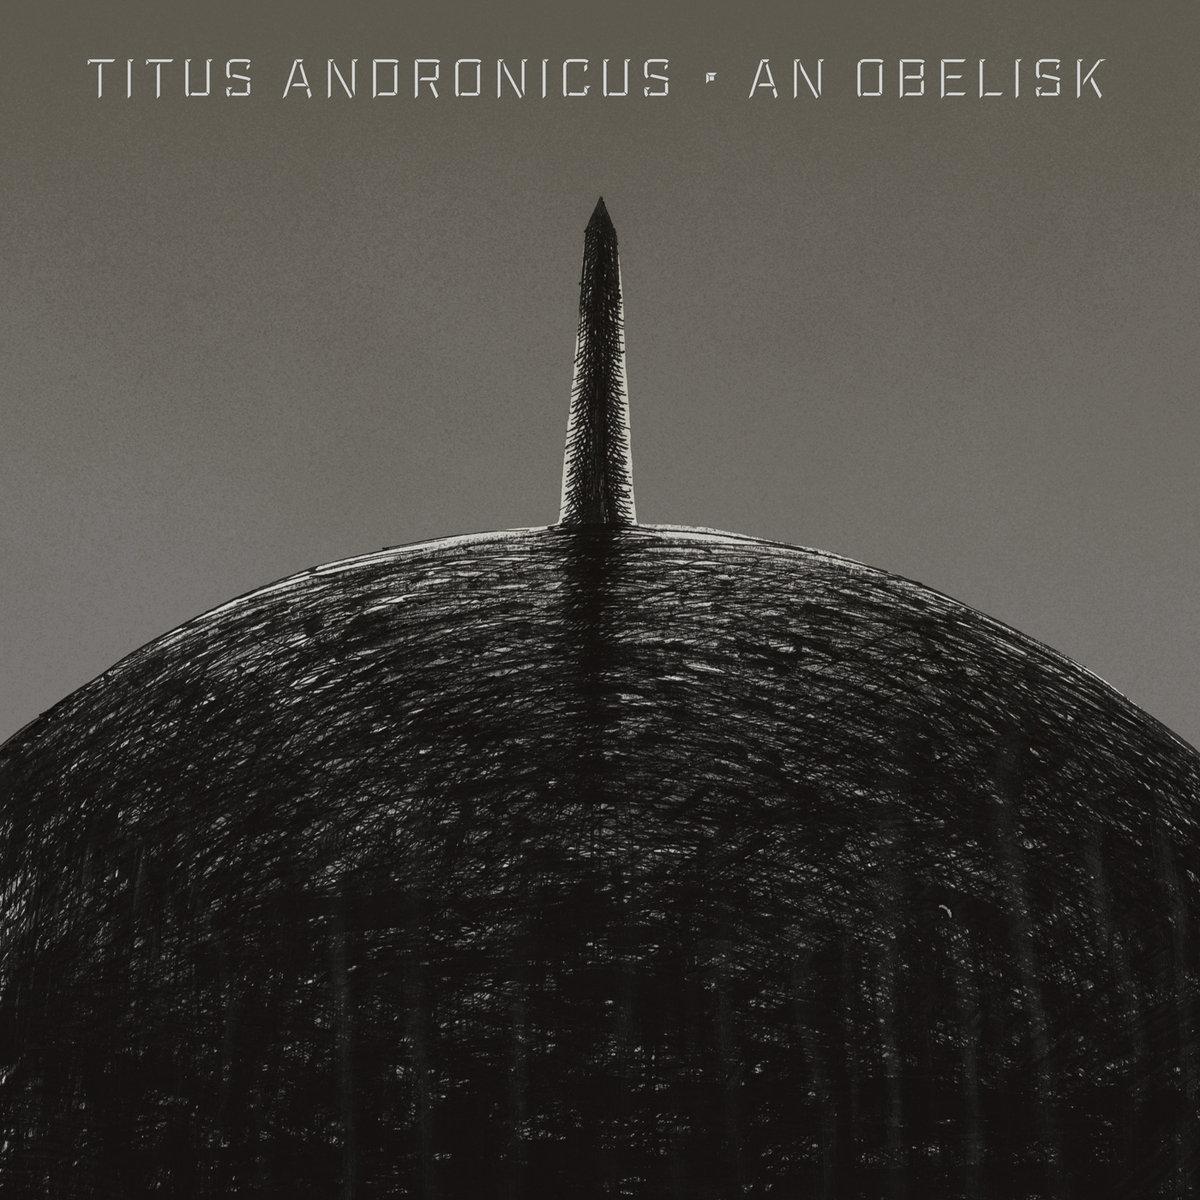 Titus Andronicus - An Obelisk LP